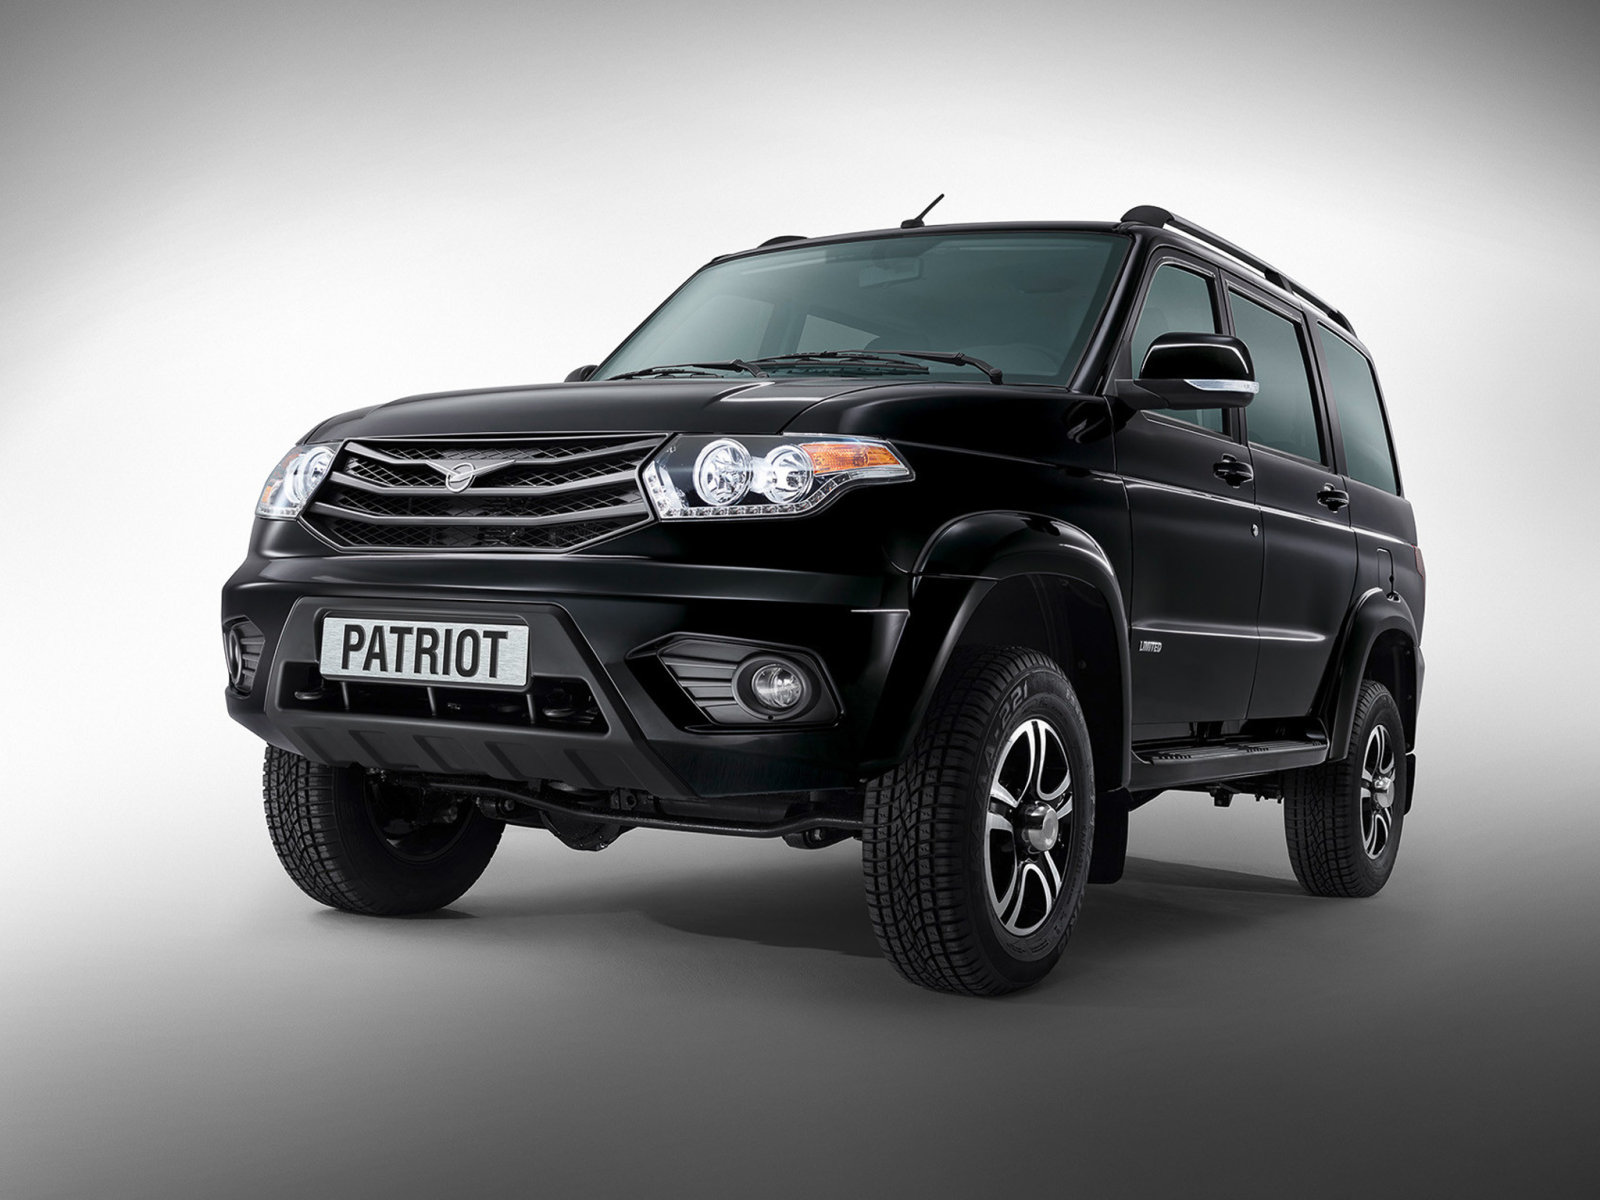 УАЗ запустит вИране завод посборке машин до 2018г.